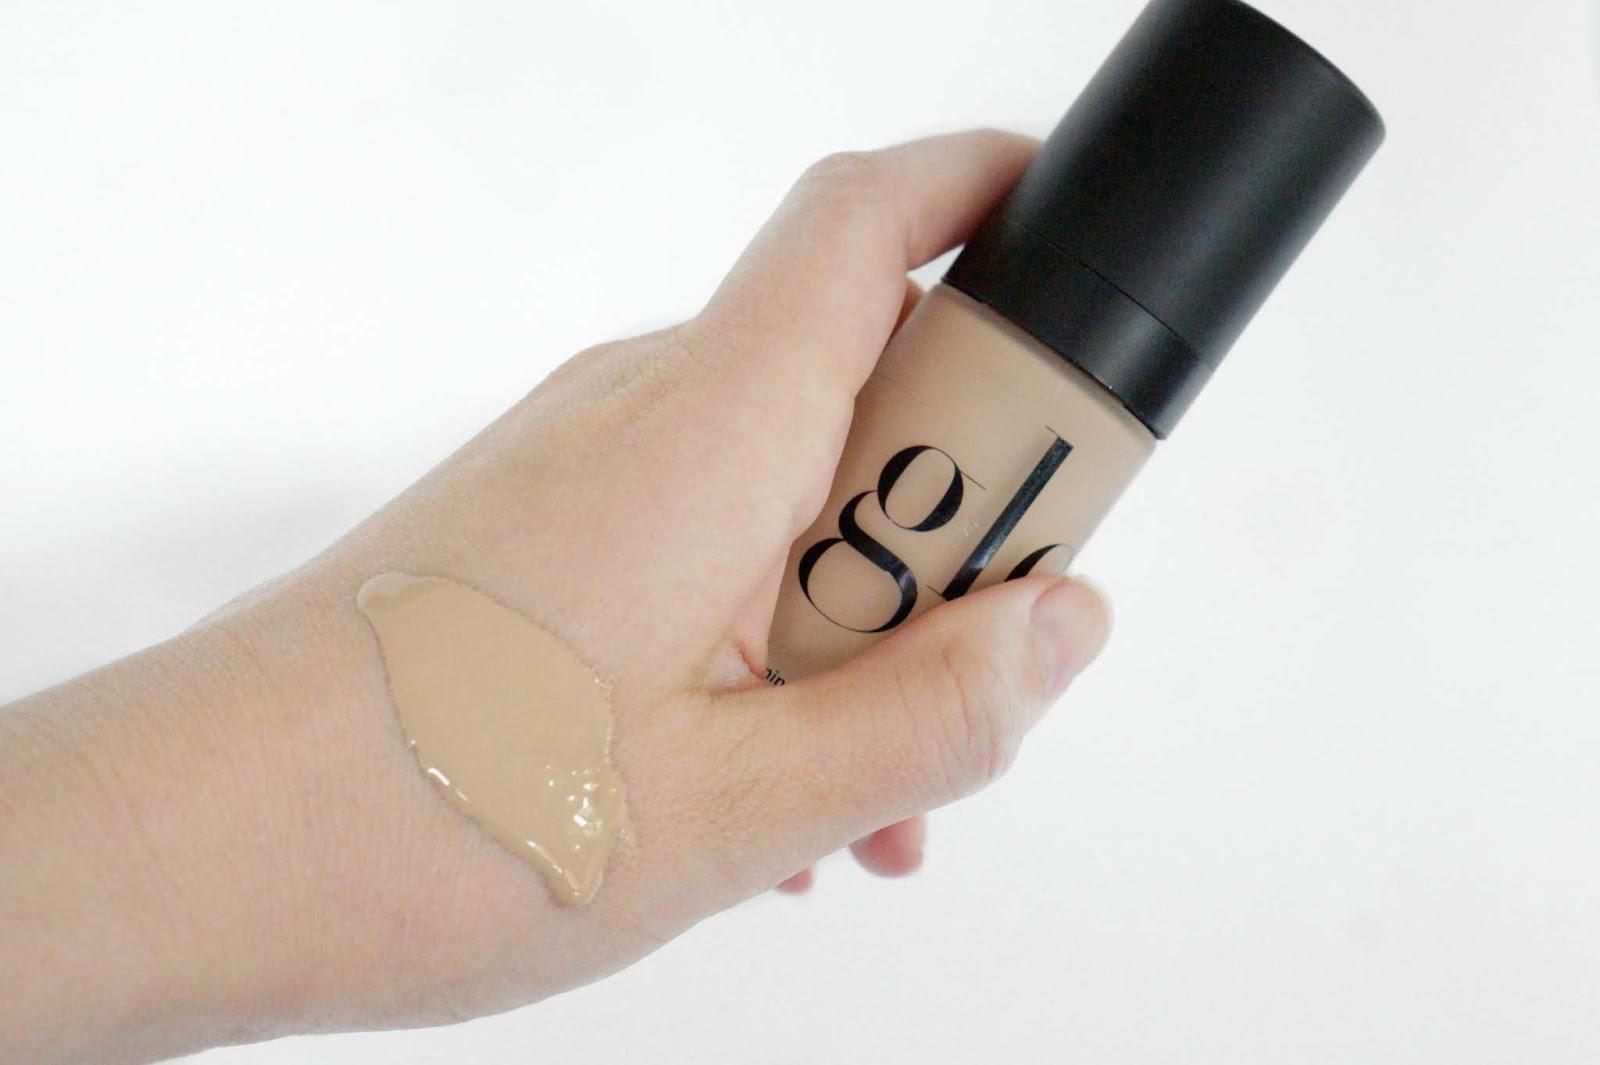 Glo_Skin_Beauty_Luminous_Liquid_Foundation